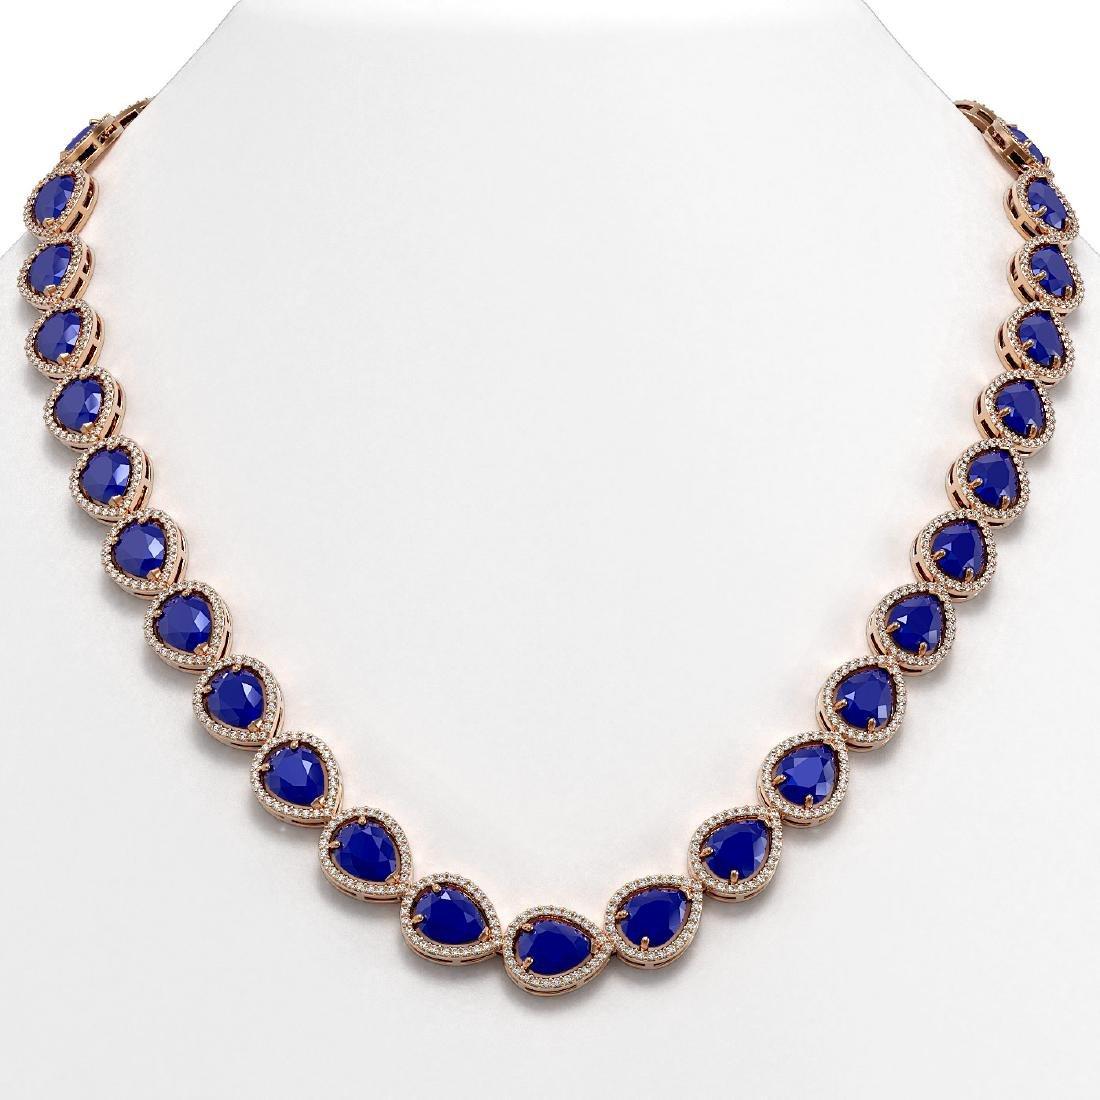 64.01 CTW Sapphire & Diamond Halo Necklace 10K Rose